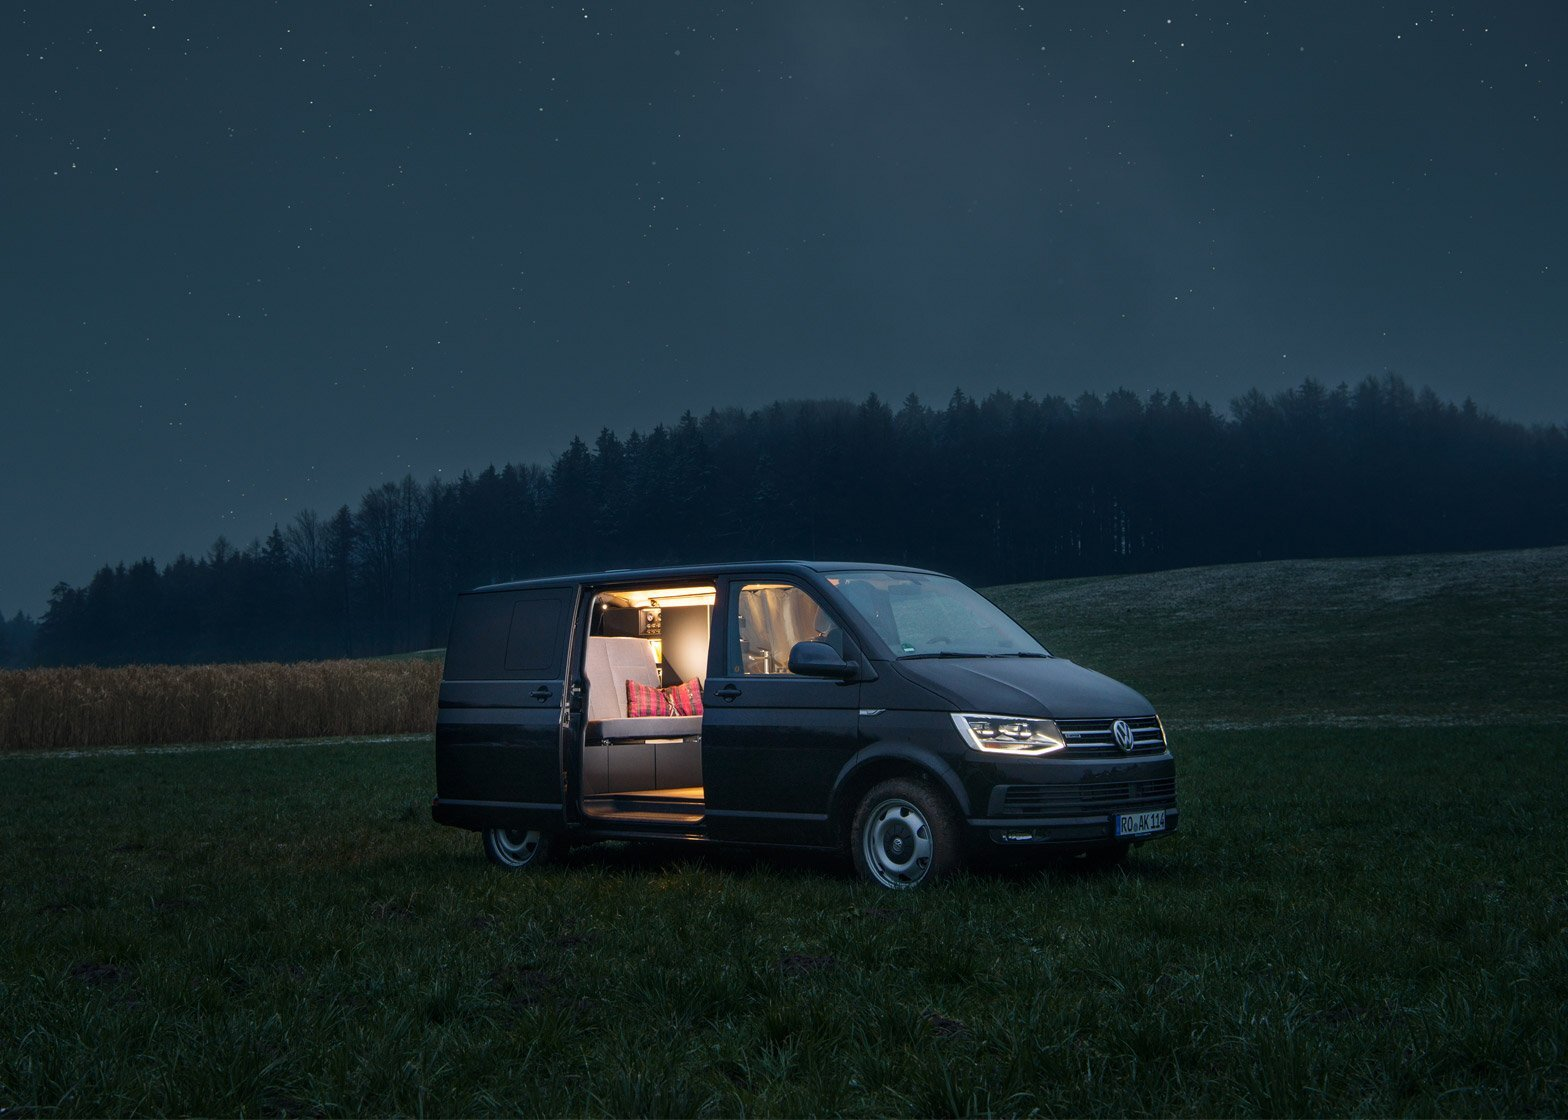 volkswagen t6 converted into a stylish camper van by nols. Black Bedroom Furniture Sets. Home Design Ideas